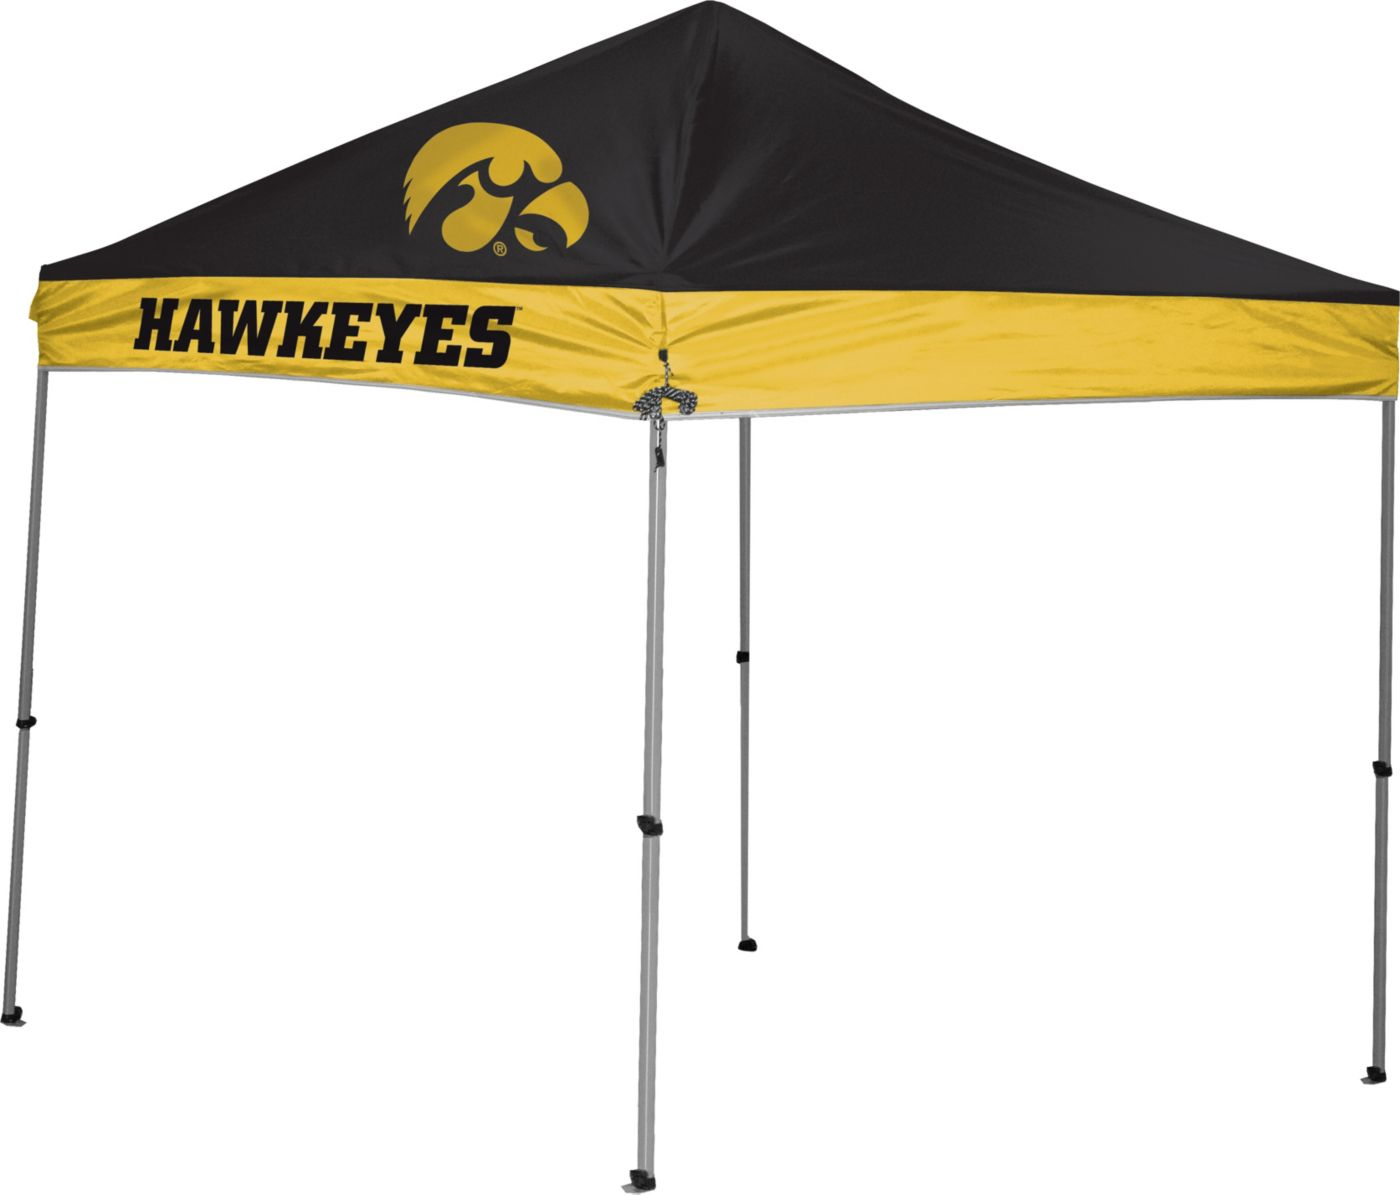 Rawlings Iowa Hawkeyes 9' x 9' Sideline Canopy Tent